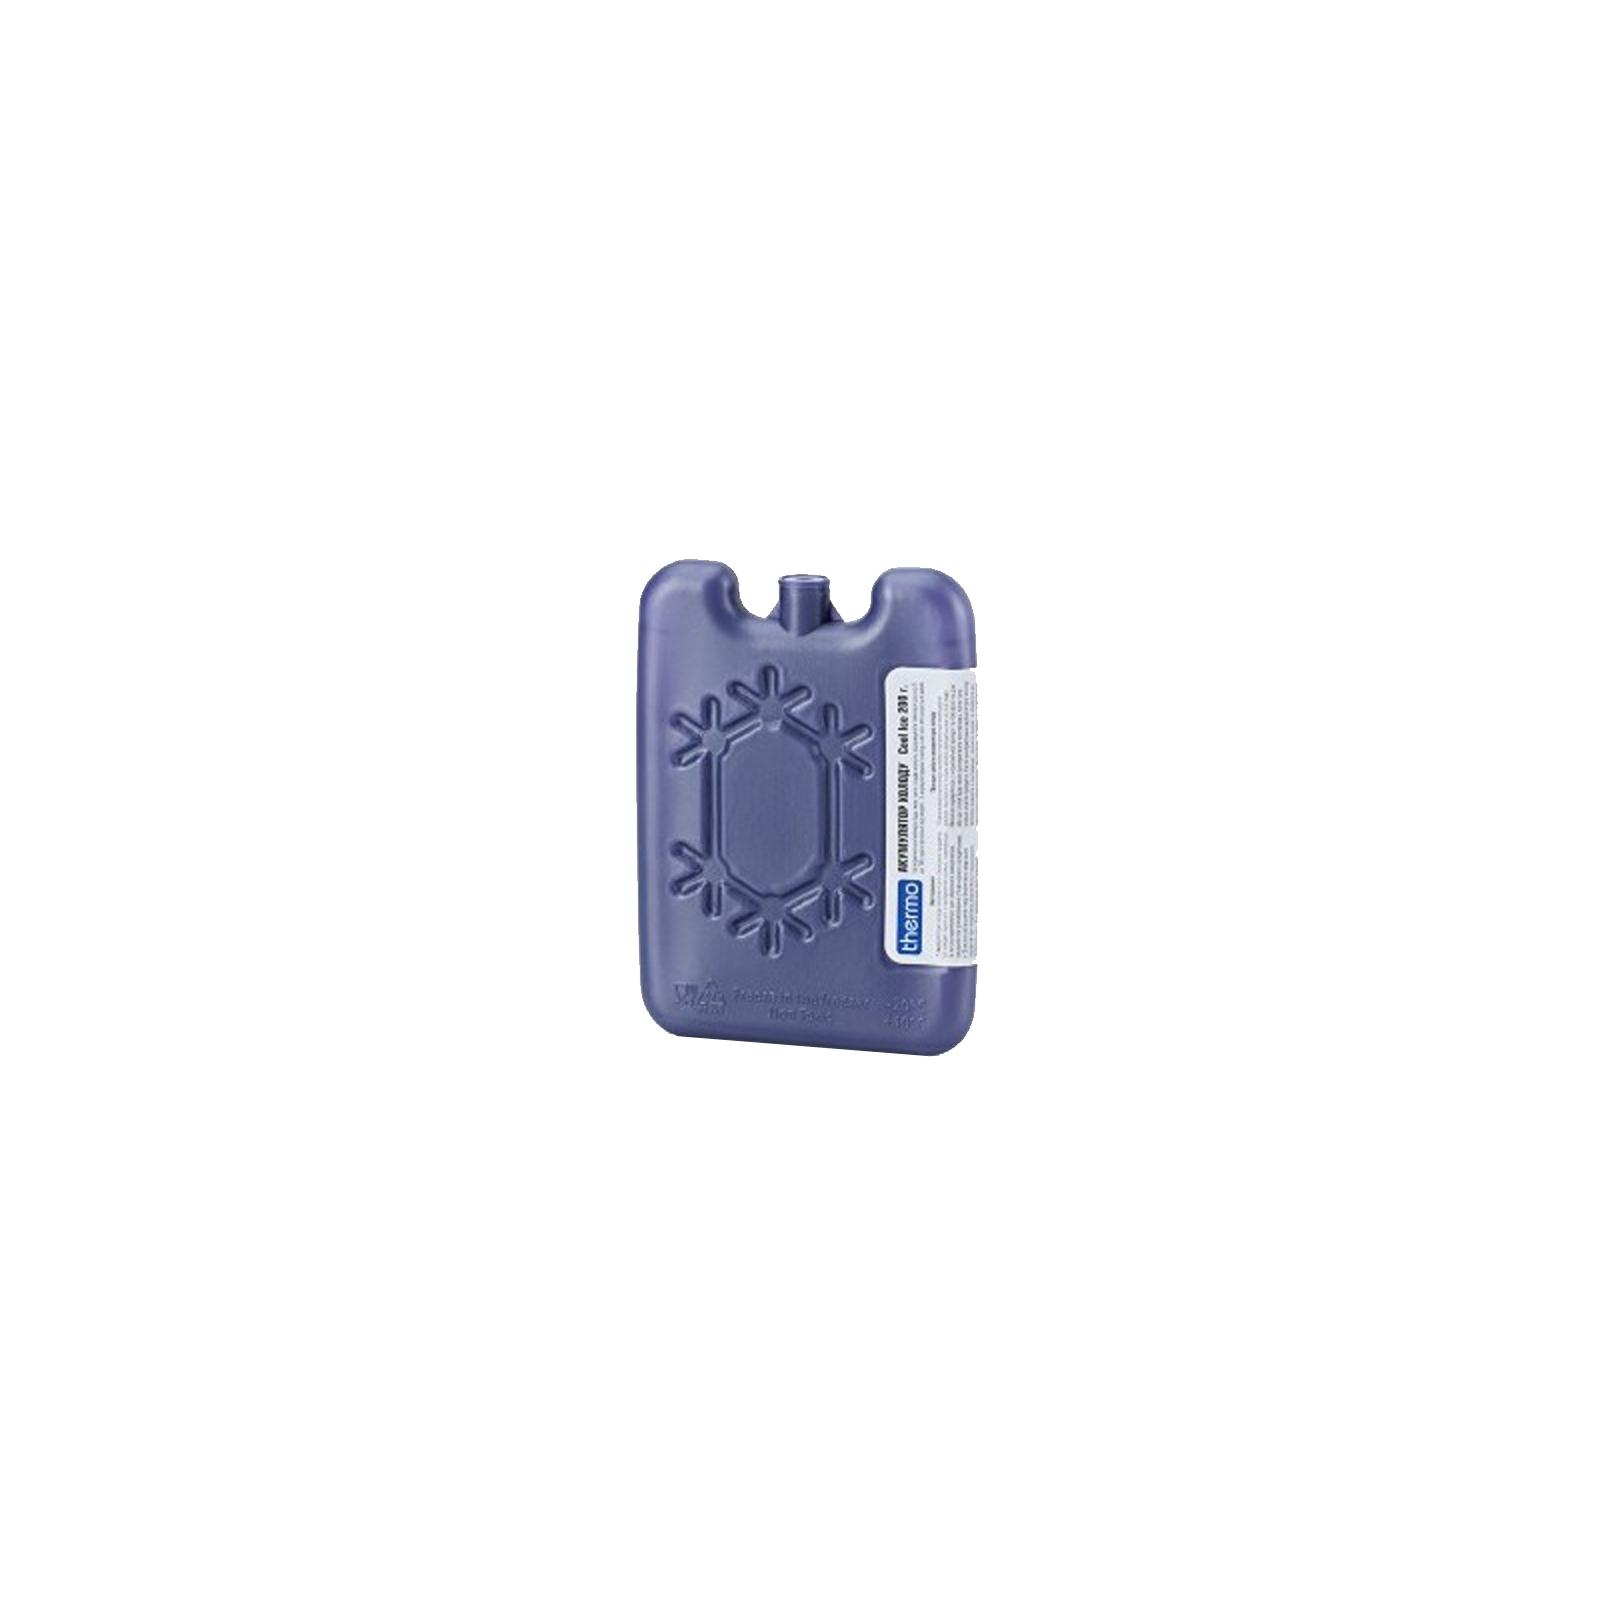 Аккумулятор холода Thermo Cool-ice 6*200 г (4820152617392) изображение 2